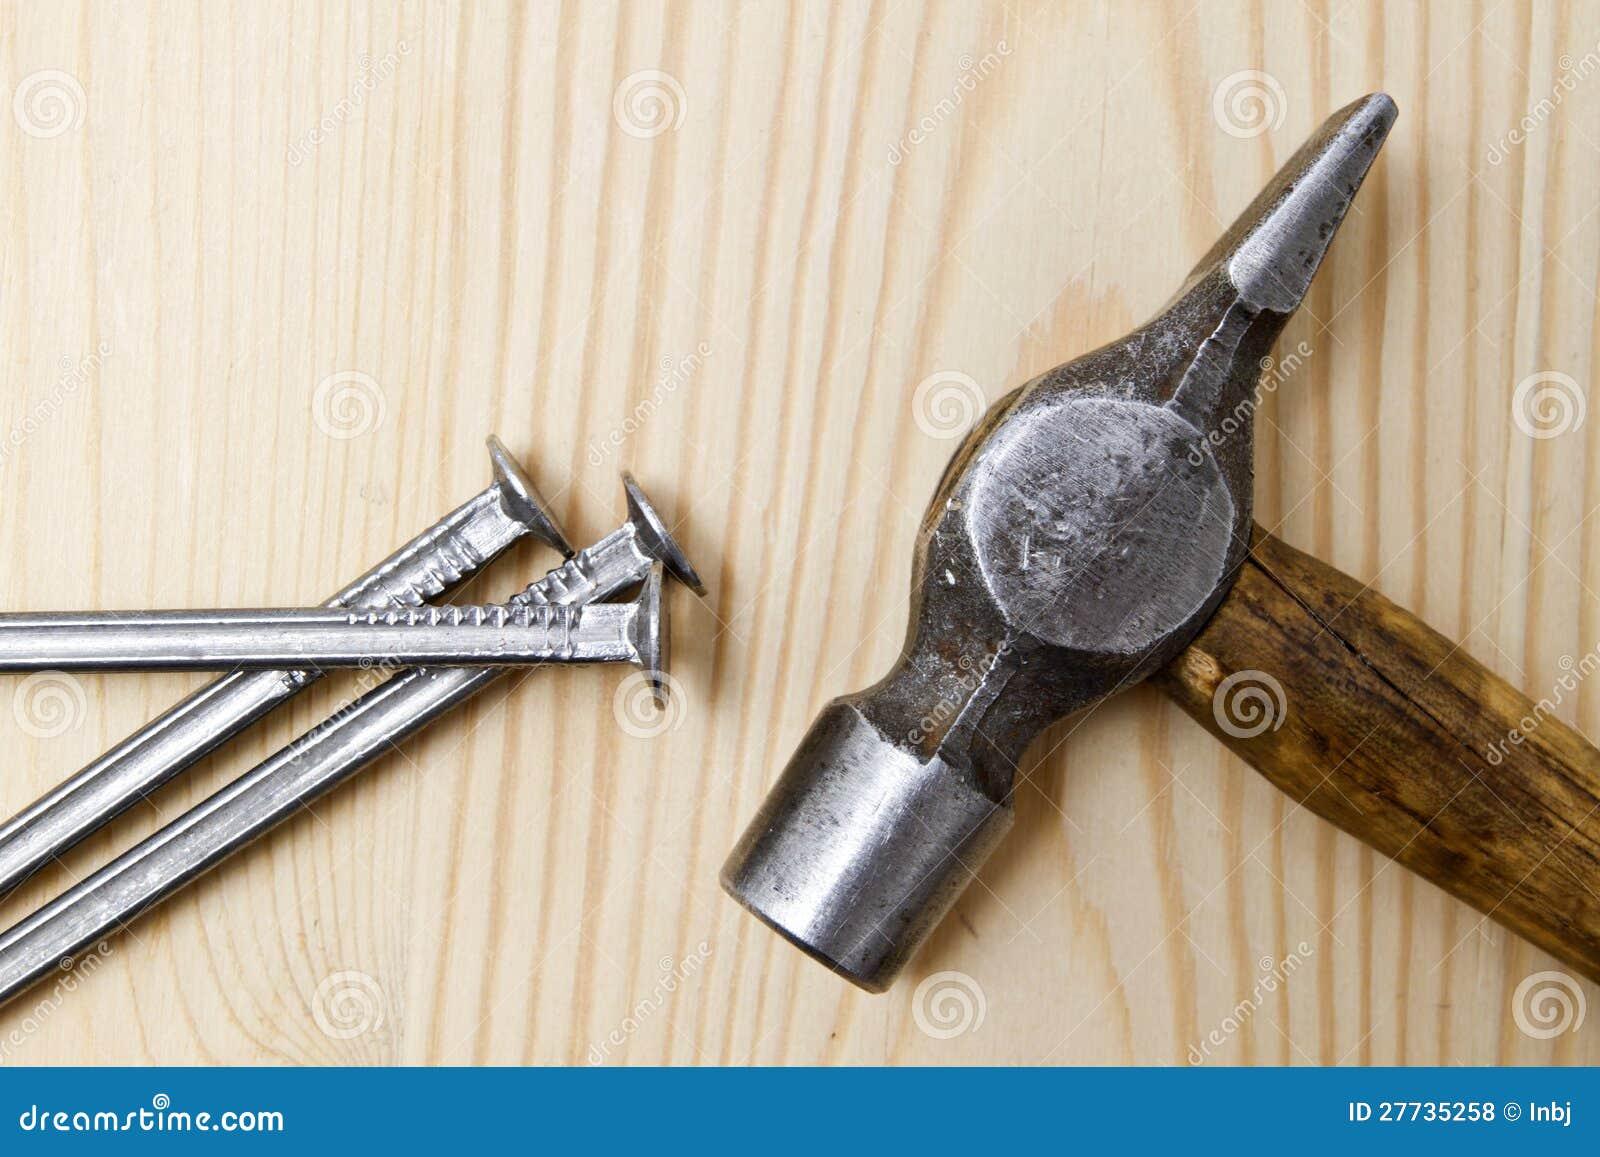 Alter Hammer und Nägel